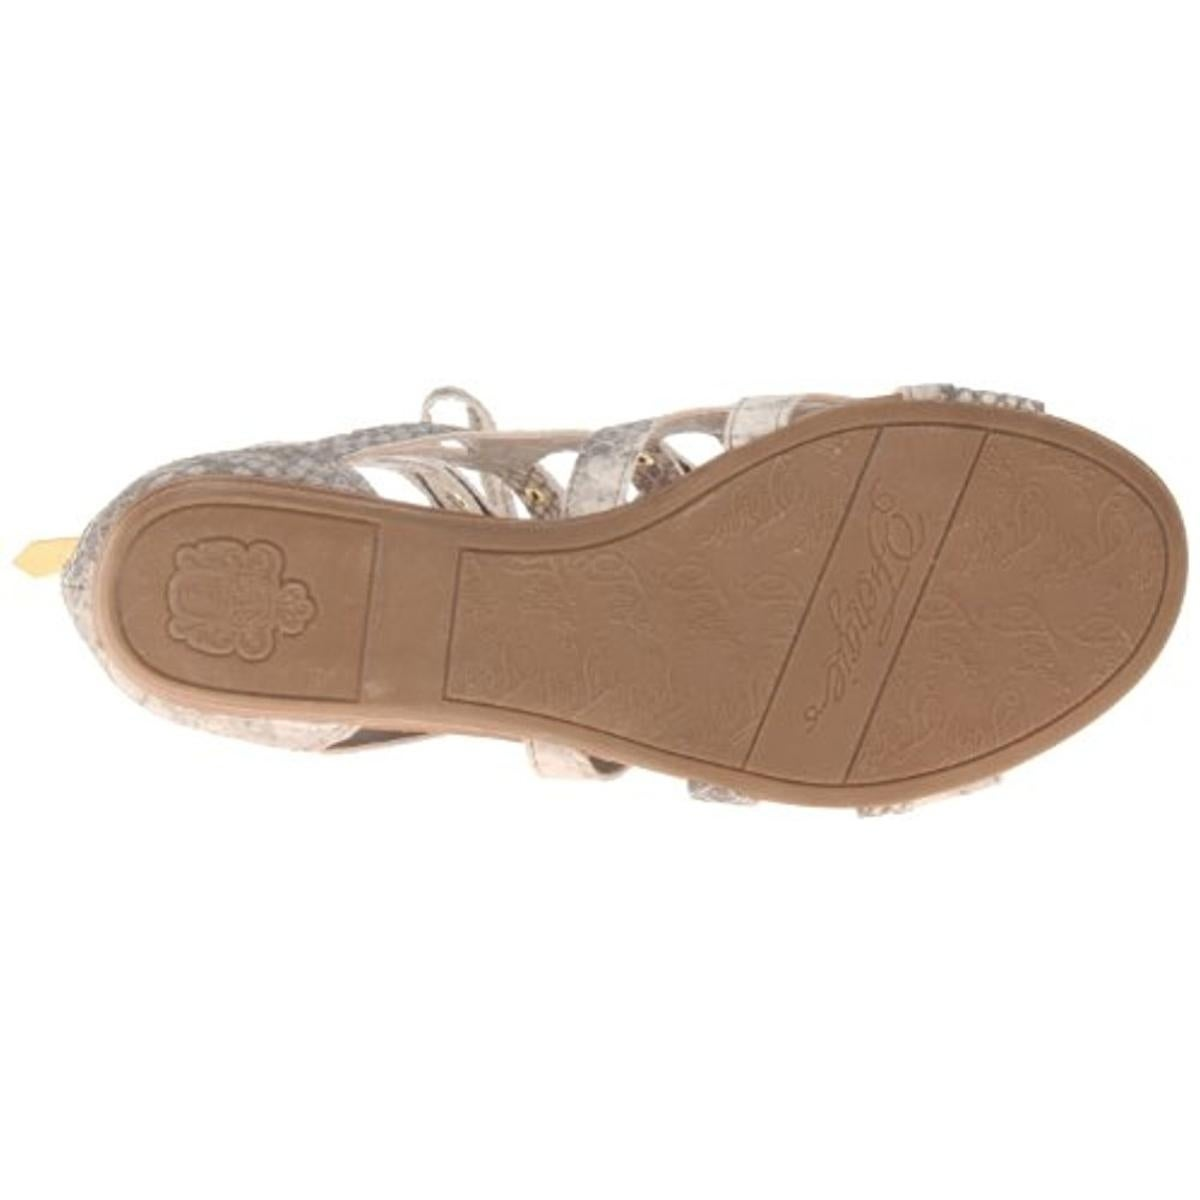 1f426466256f Shop Fergie Womens Glow Gladiator Sandals Leather Snake Print - 6.5 medium  (b